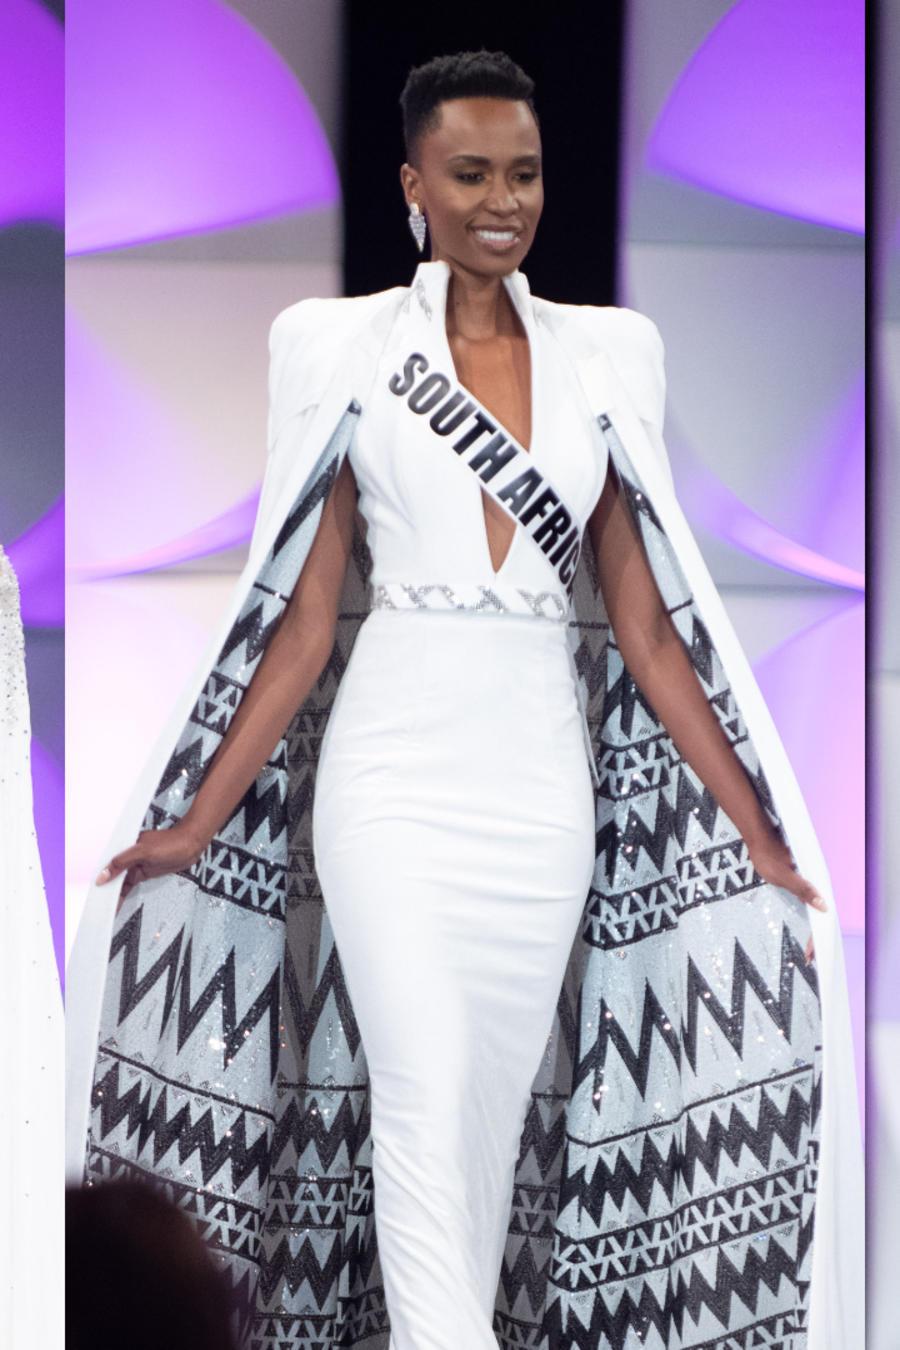 Miss México, Miss Sudáfrica, Miss Colombia